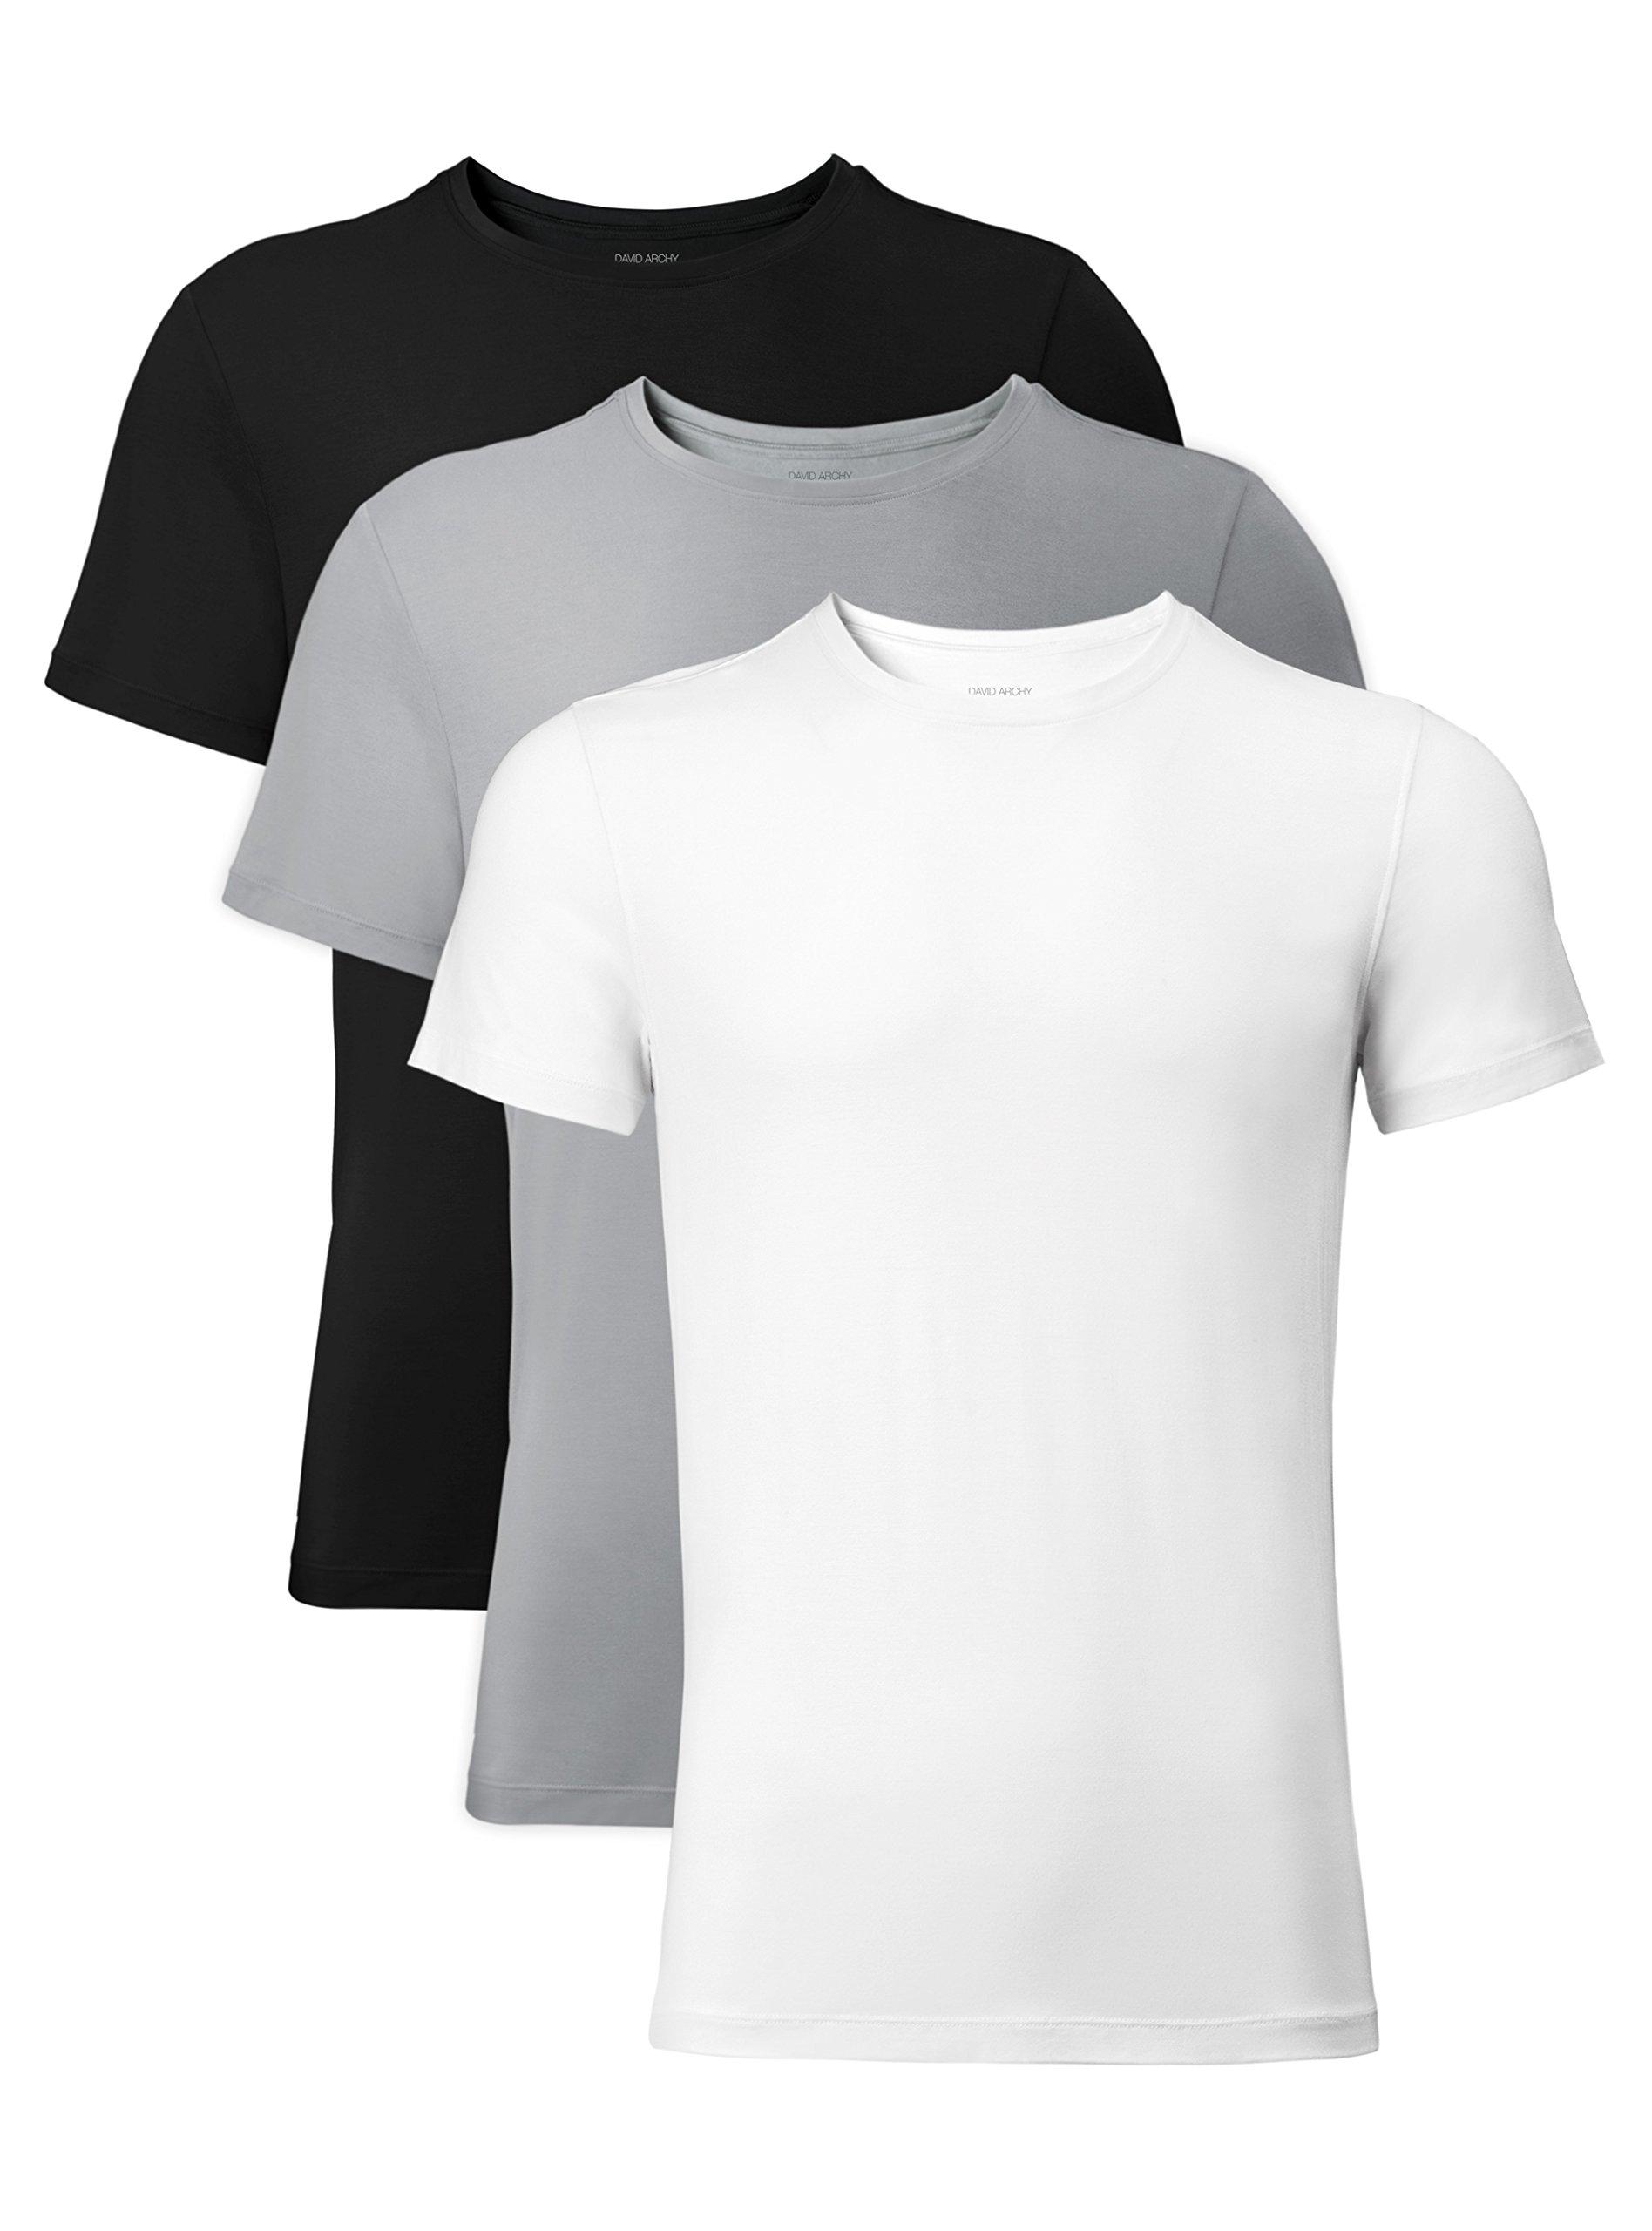 David Archy Men's 3 Pack Bamboo Rayon Undershirts Crew Neck Slim Fit Tees Short Sleeve T-Shirts(S,Black/White/LightGray)